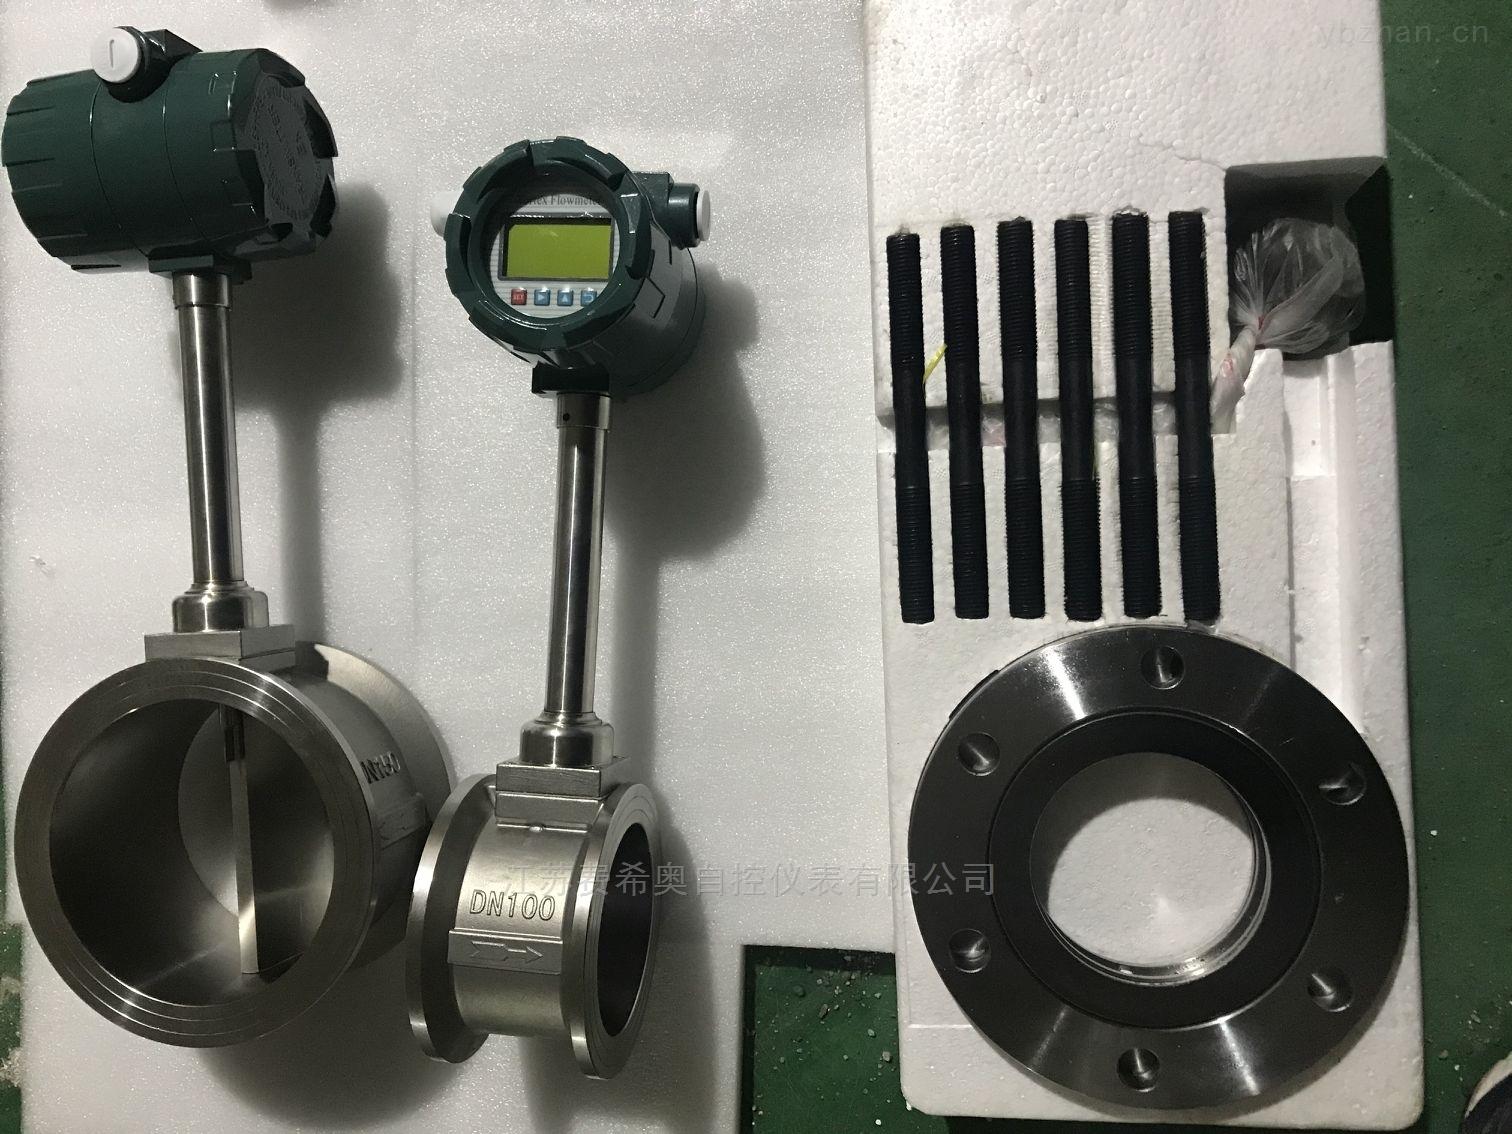 LUGB系列-抗震型涡街流量传感器